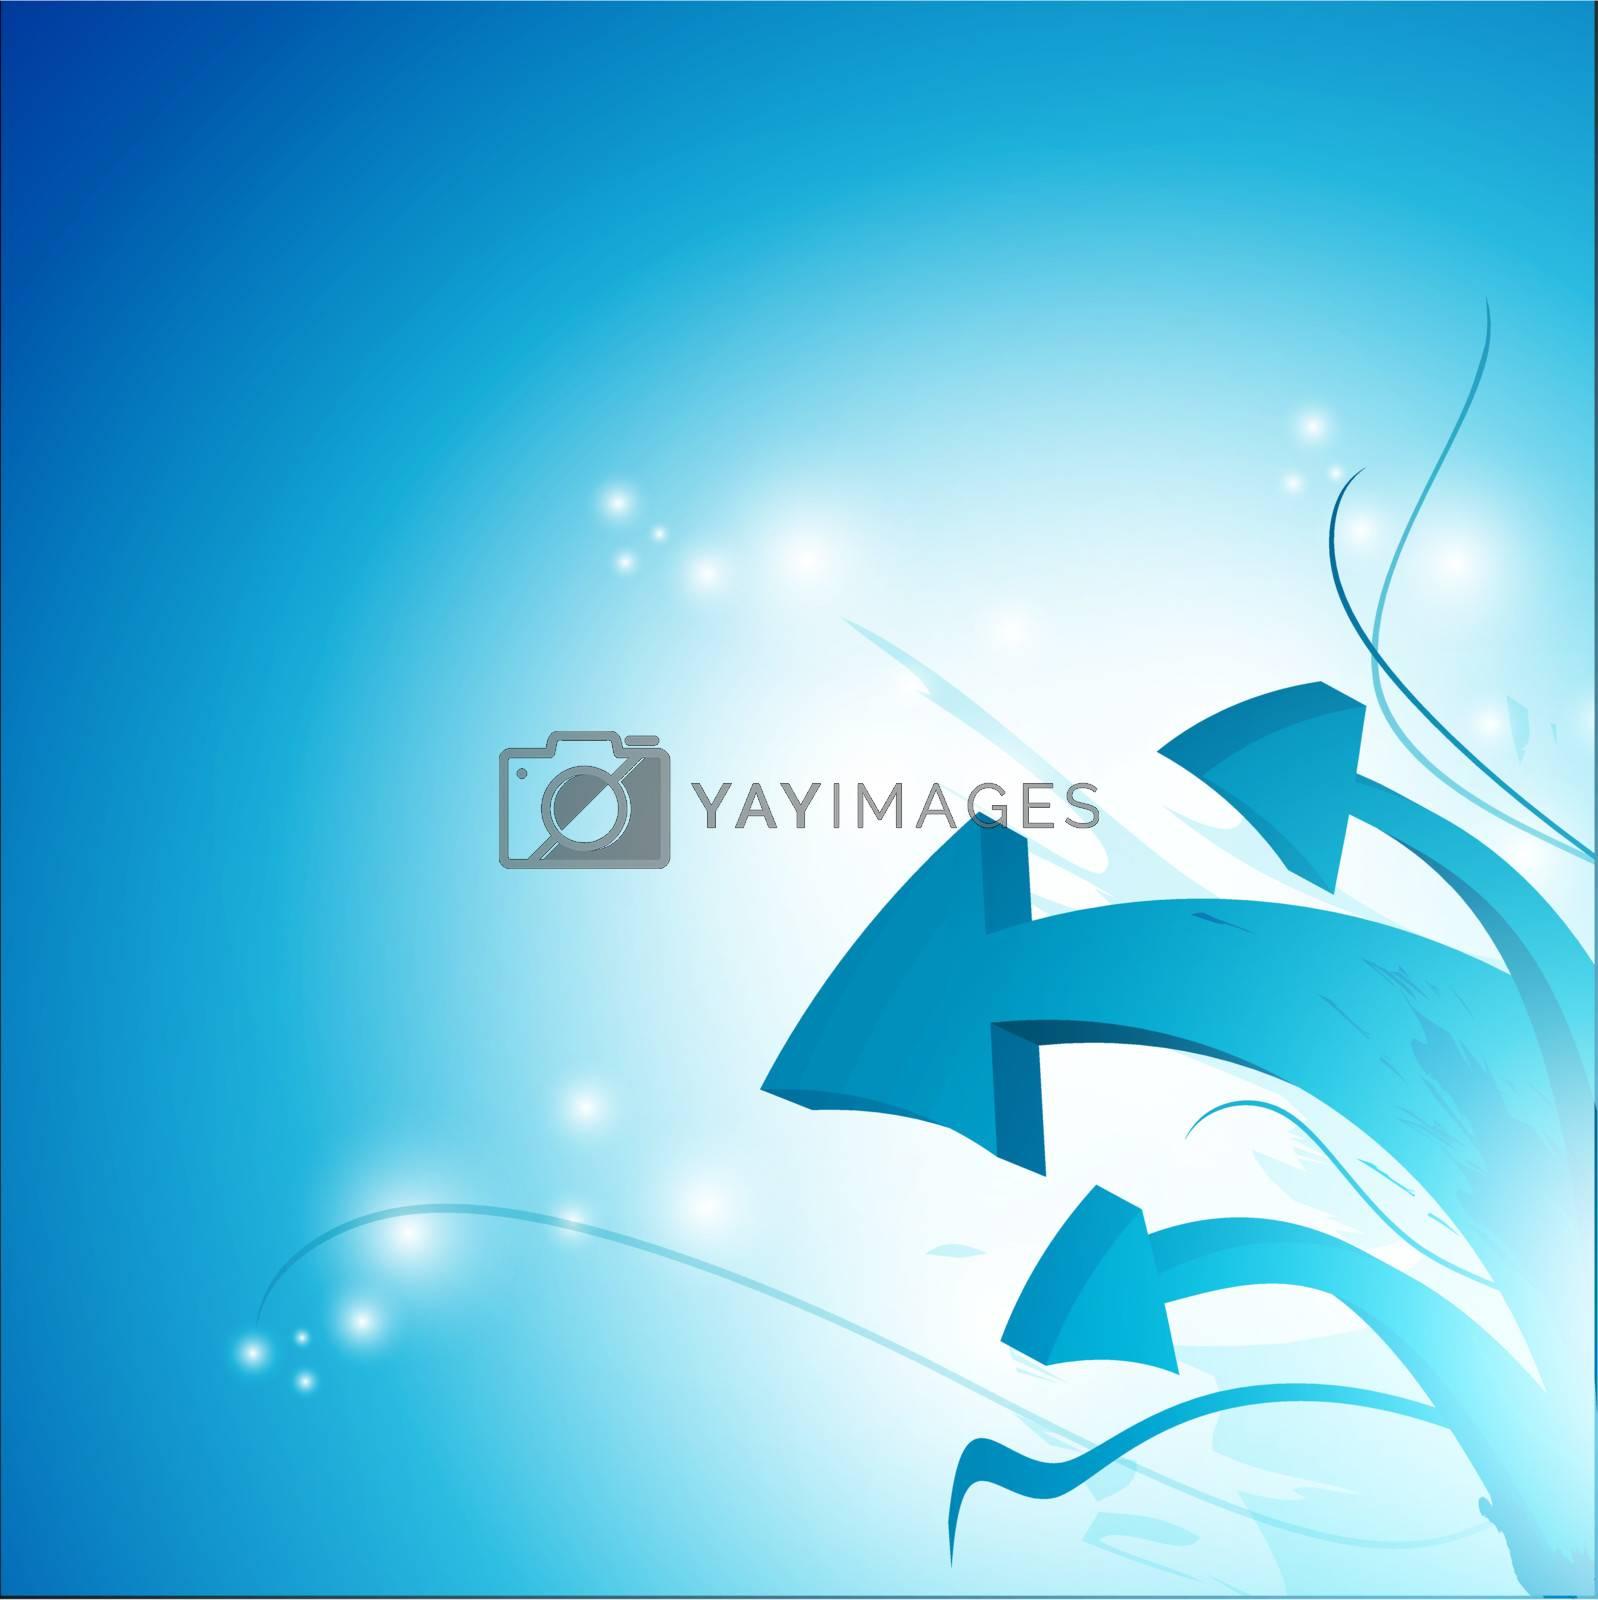 Royalty free image of arrow abstract background  by razvodovska